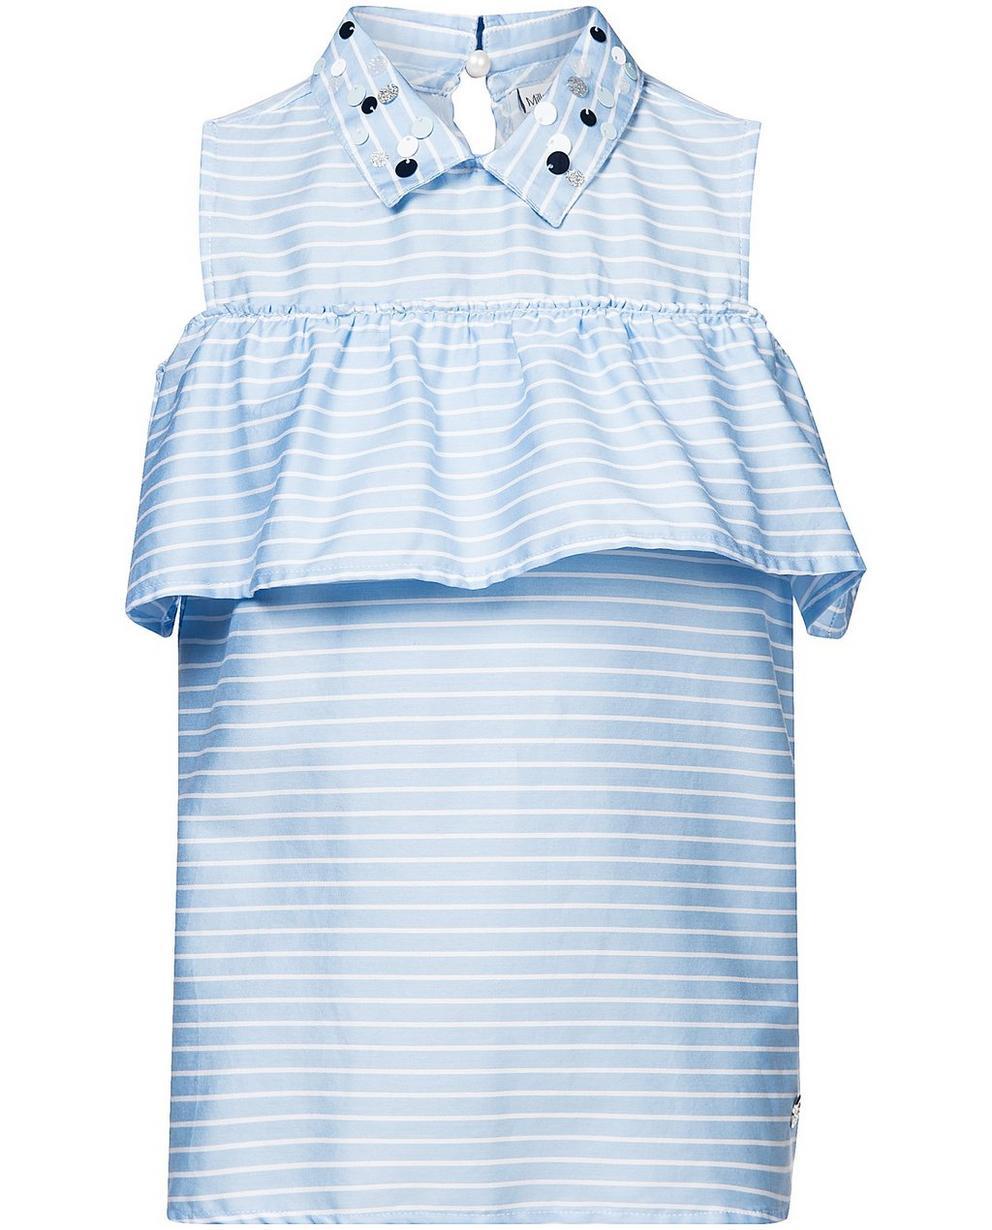 Hemden - AO1 - Gestreiftes schulterfreies Top